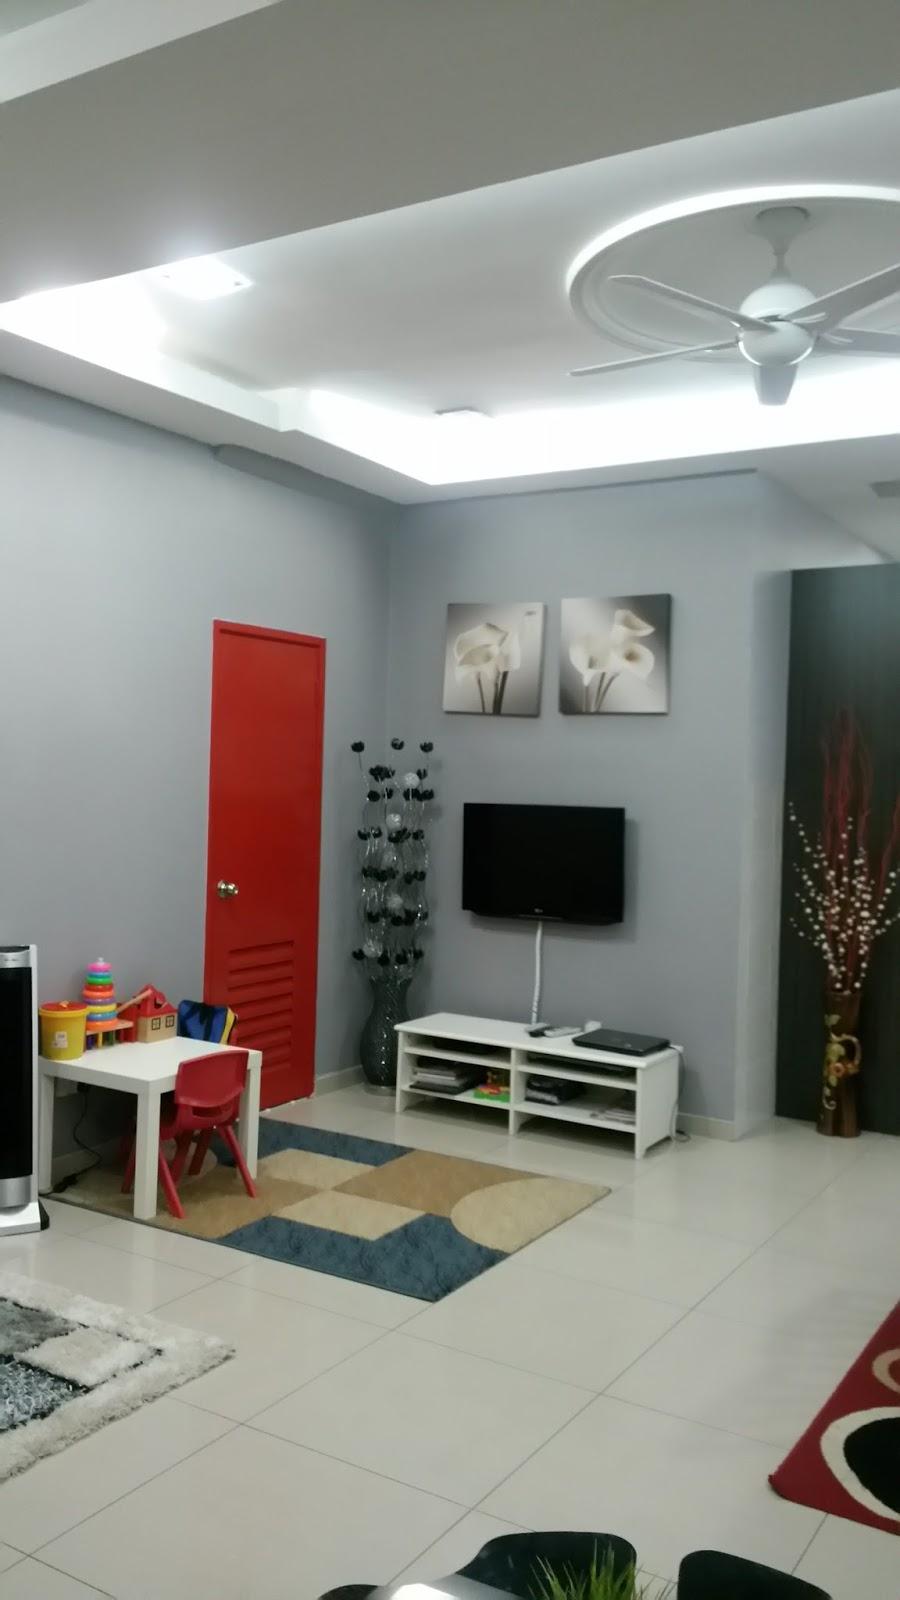 Dinding Stor Tu Saya Cat Kelabu Jugak Dulu Tv Je Yg Warna